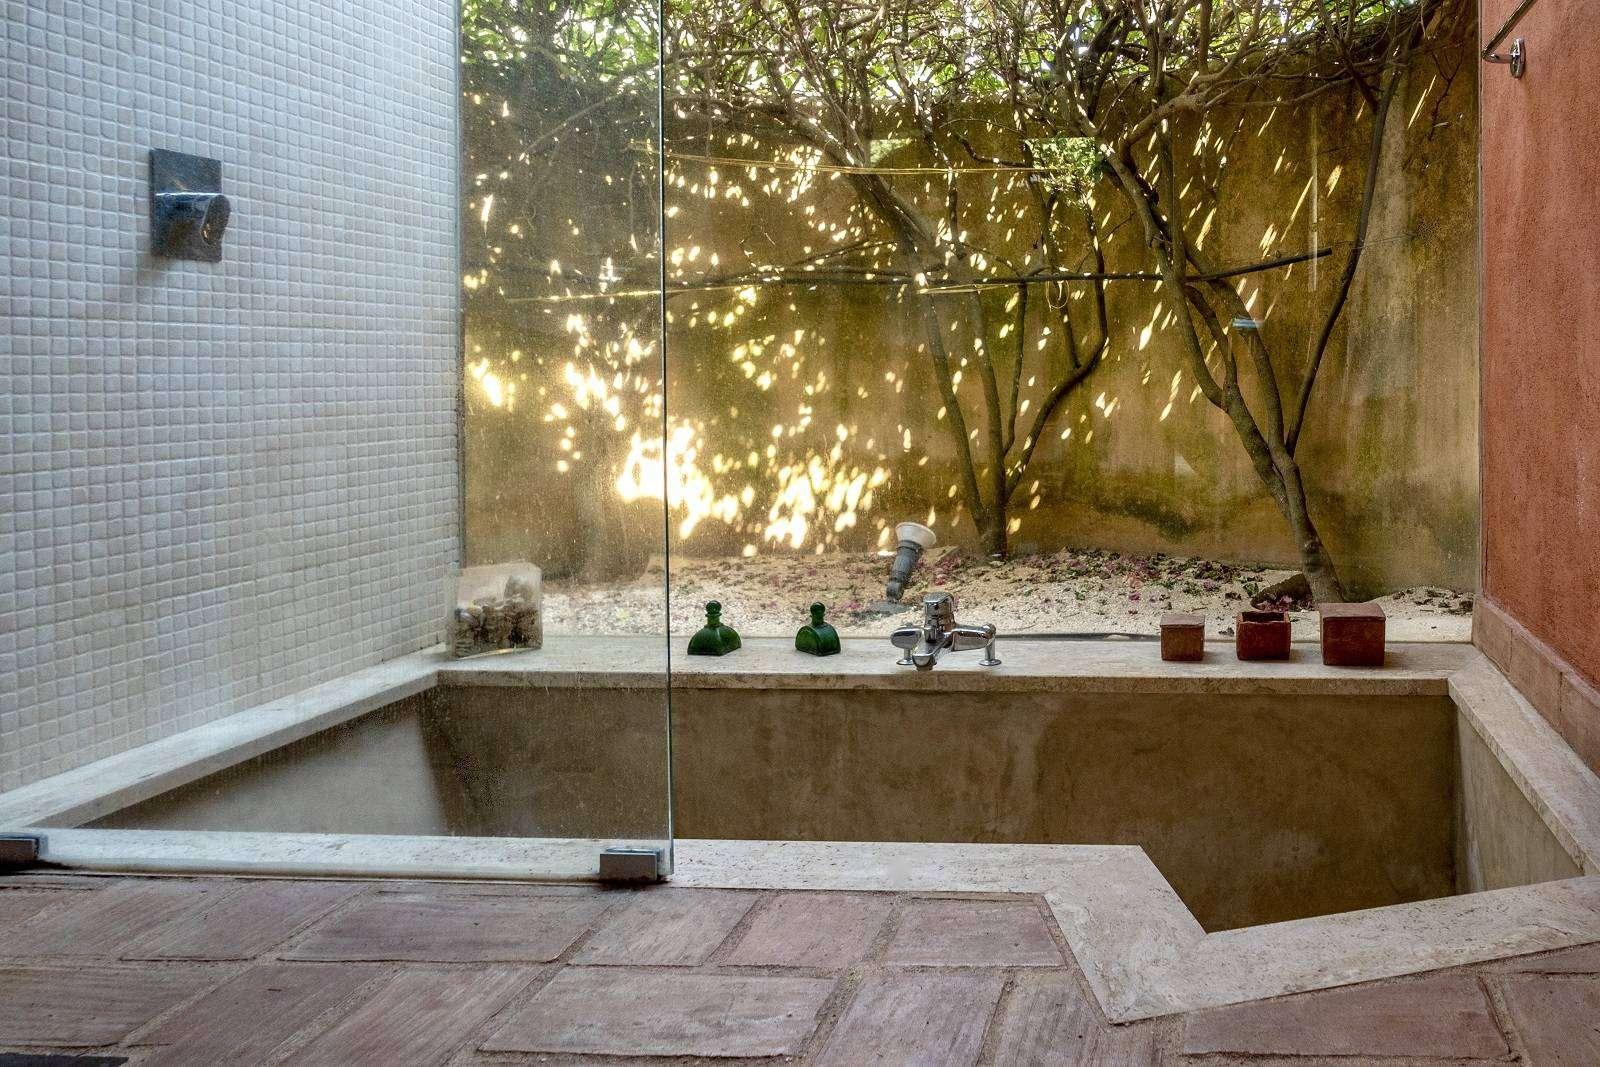 14 Afrodite Bath tub